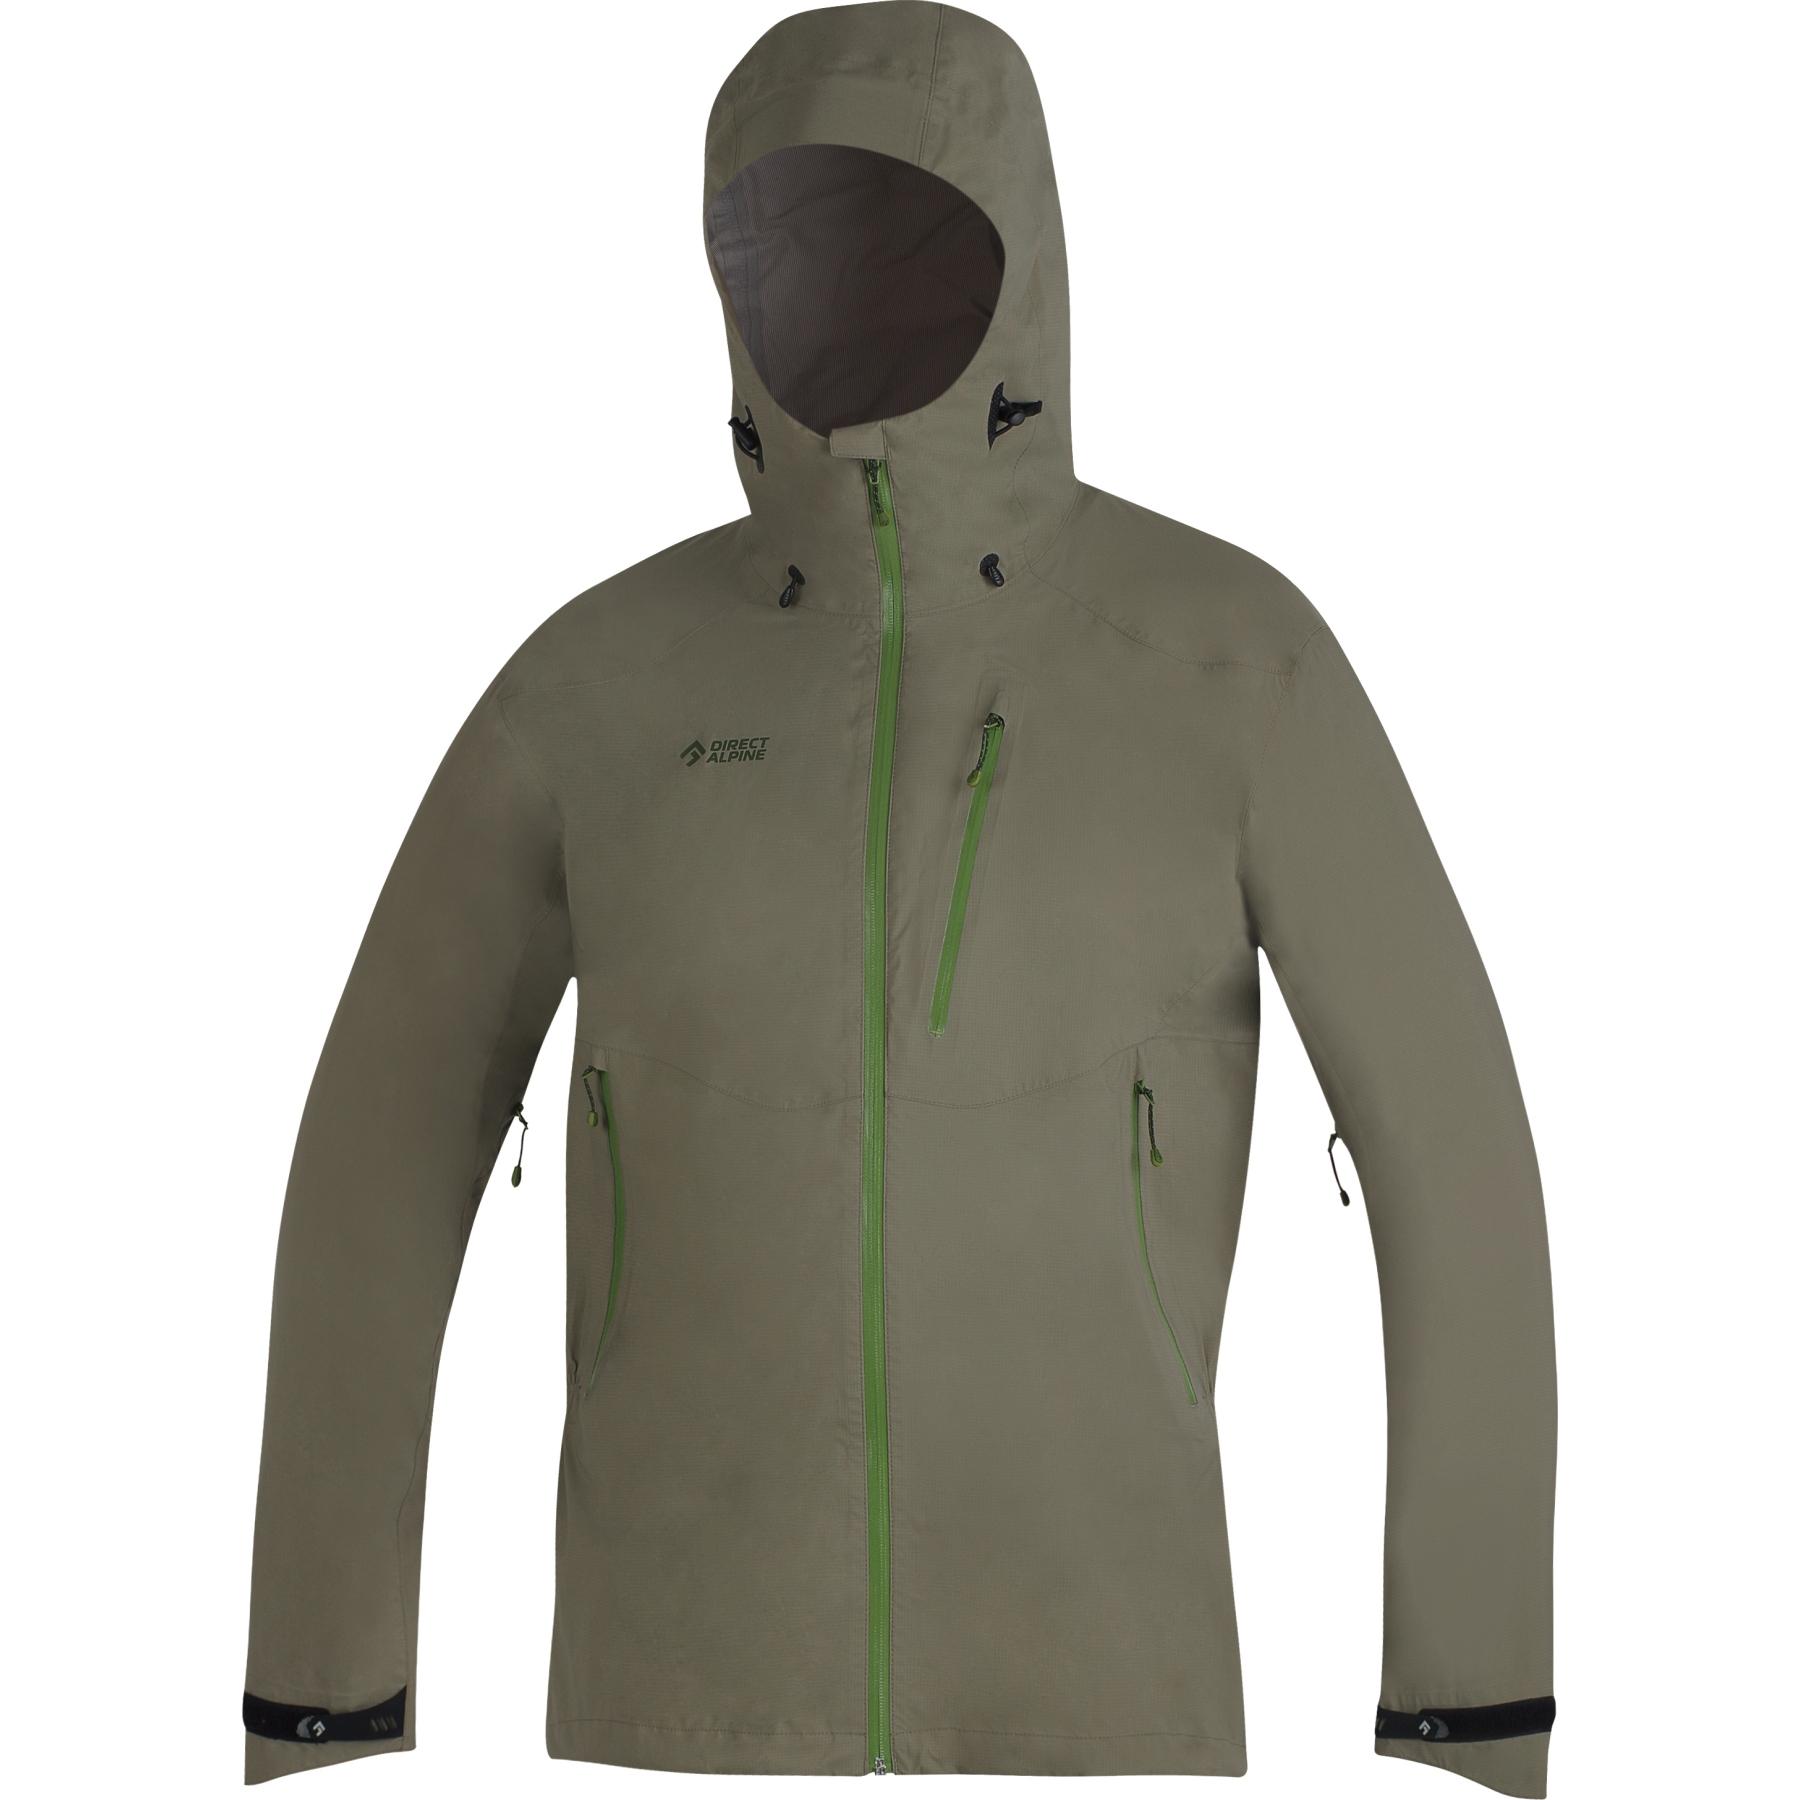 Directalpine Talung 3.0 Jacket - khaki